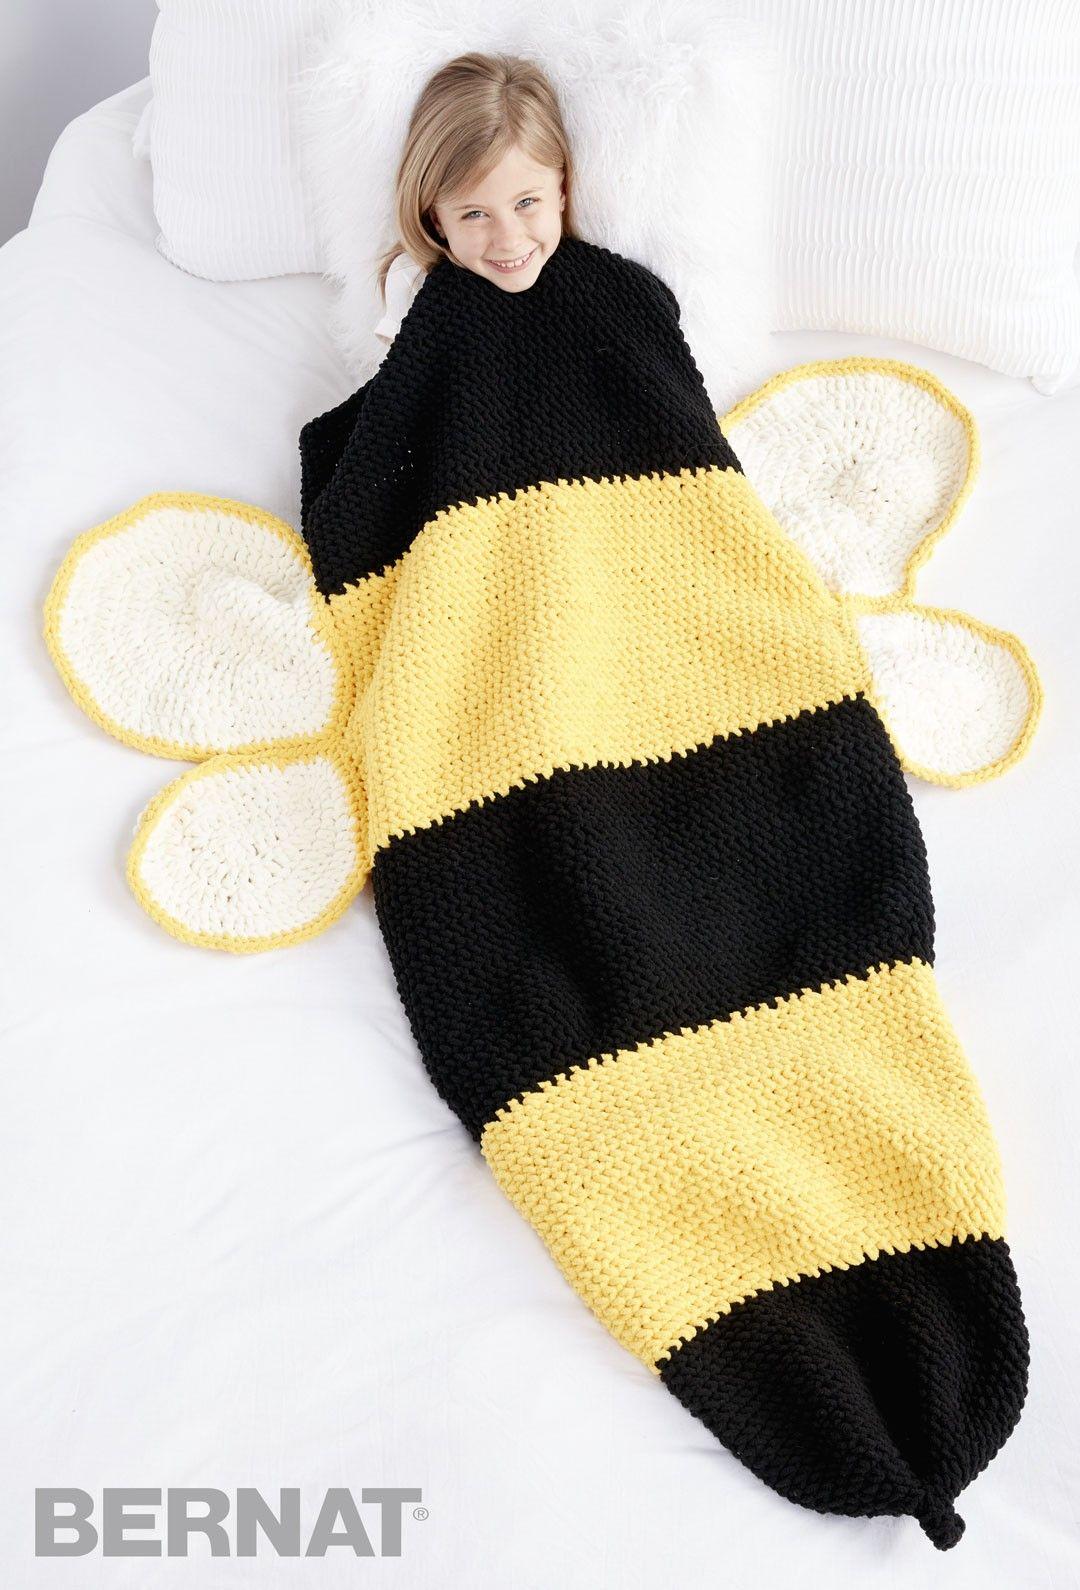 Bumble Bee Crochet Snuggle Sack - Patterns | Yarnspirations ...